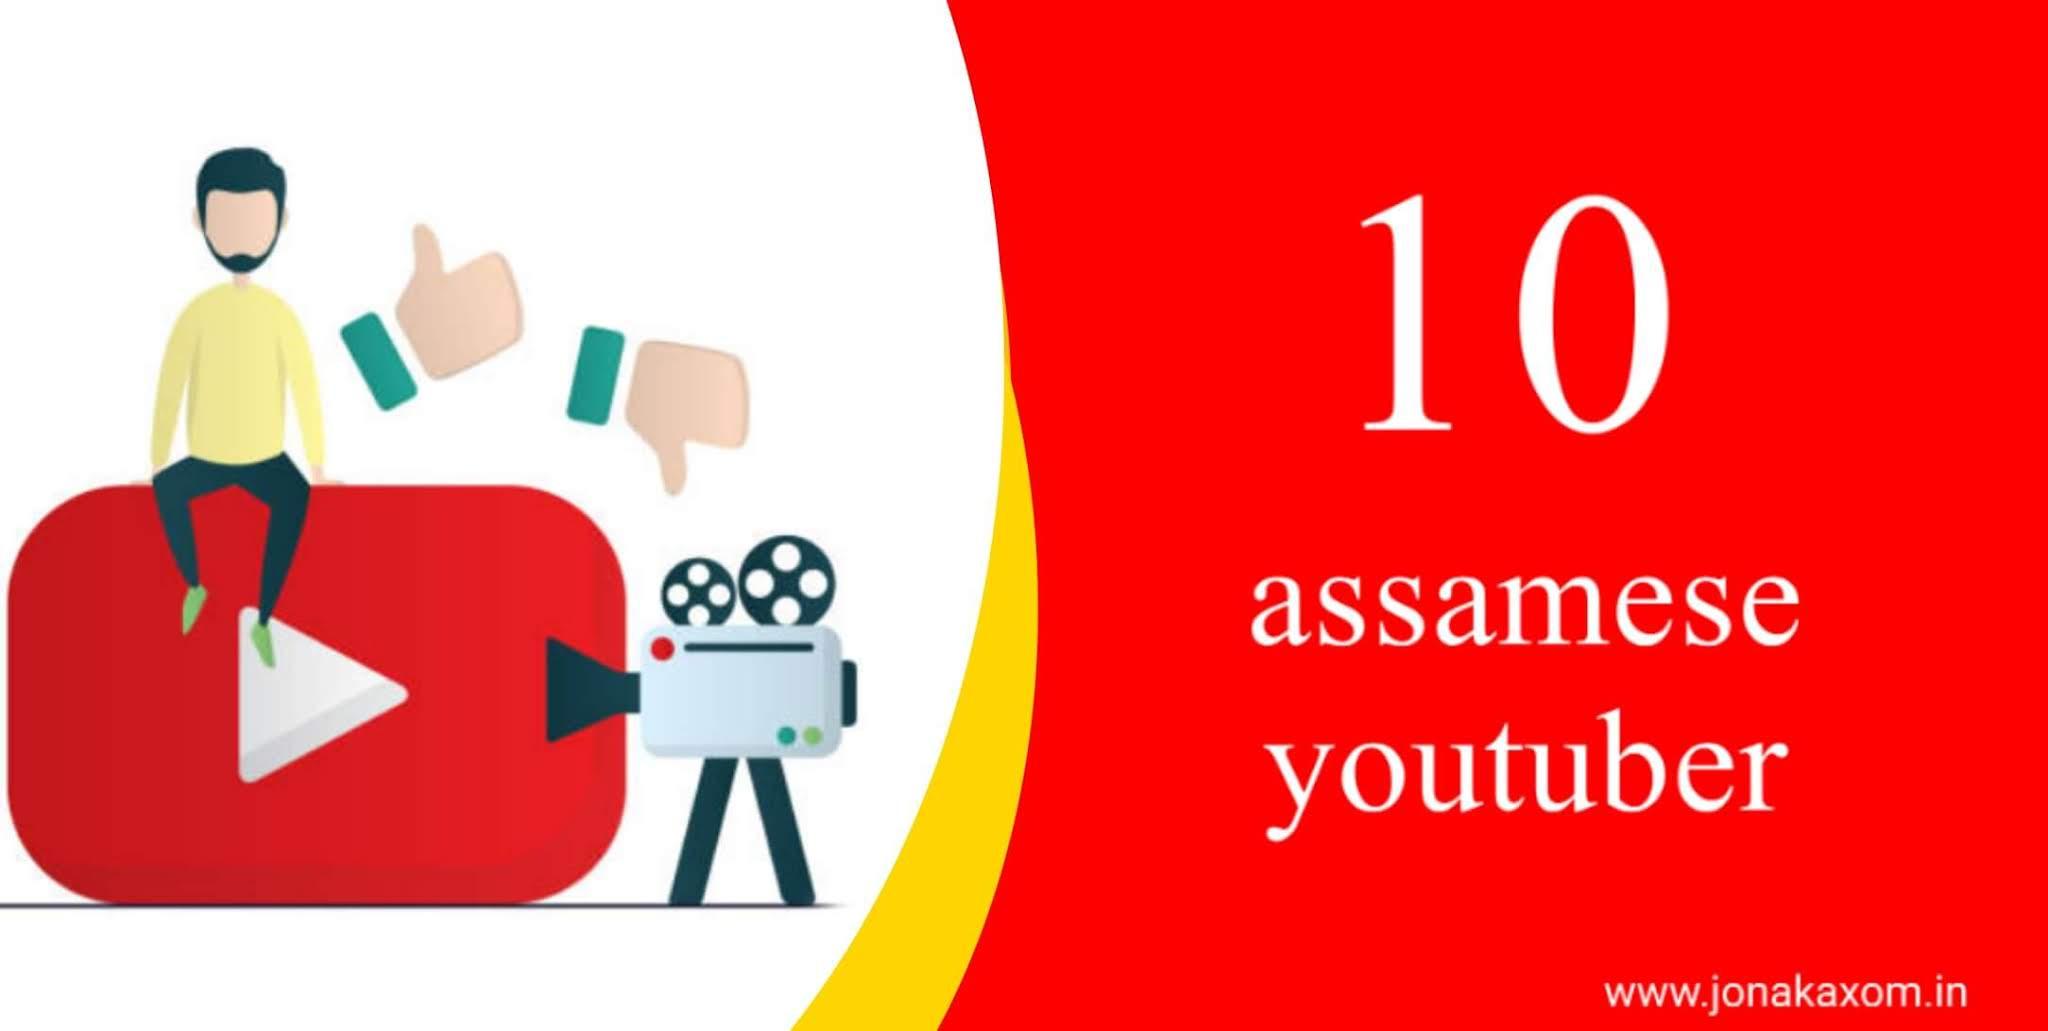 assamese youtube channel  top 10 youtubers in assam 2021